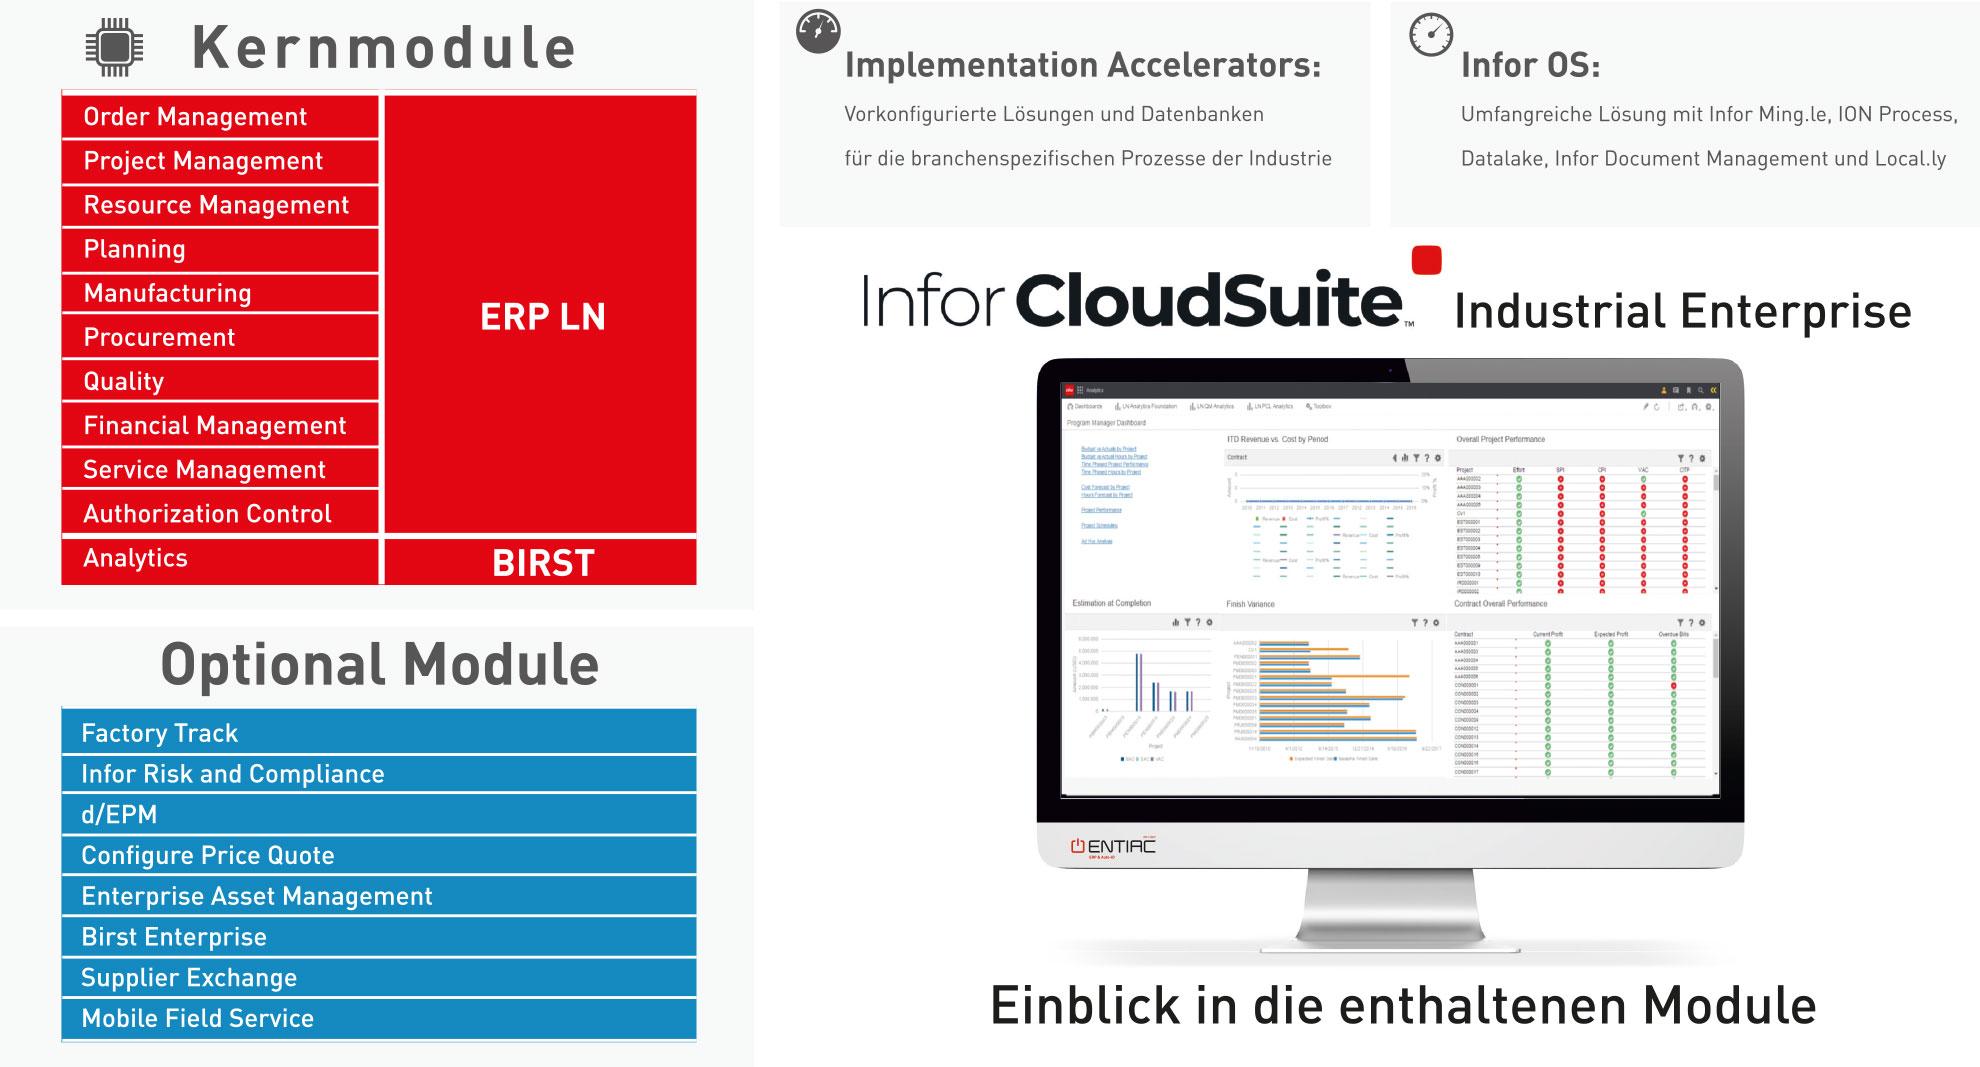 Infor CloudSuite Industrial Enterprise Modulübersicht